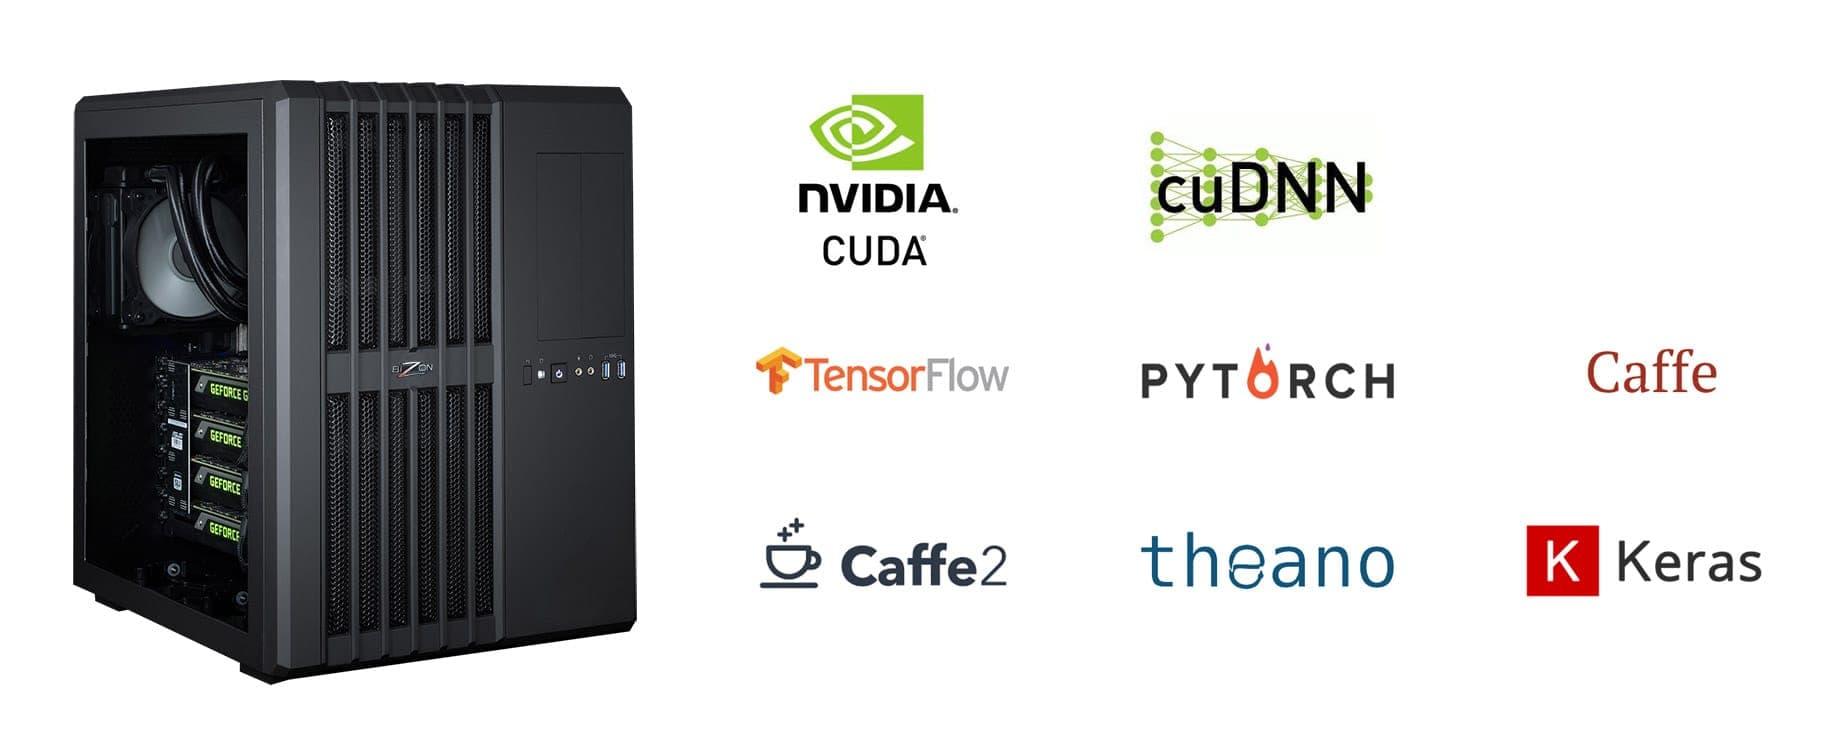 BIZON G3000 – 2-4 GPU Deep Learning Workstation PC